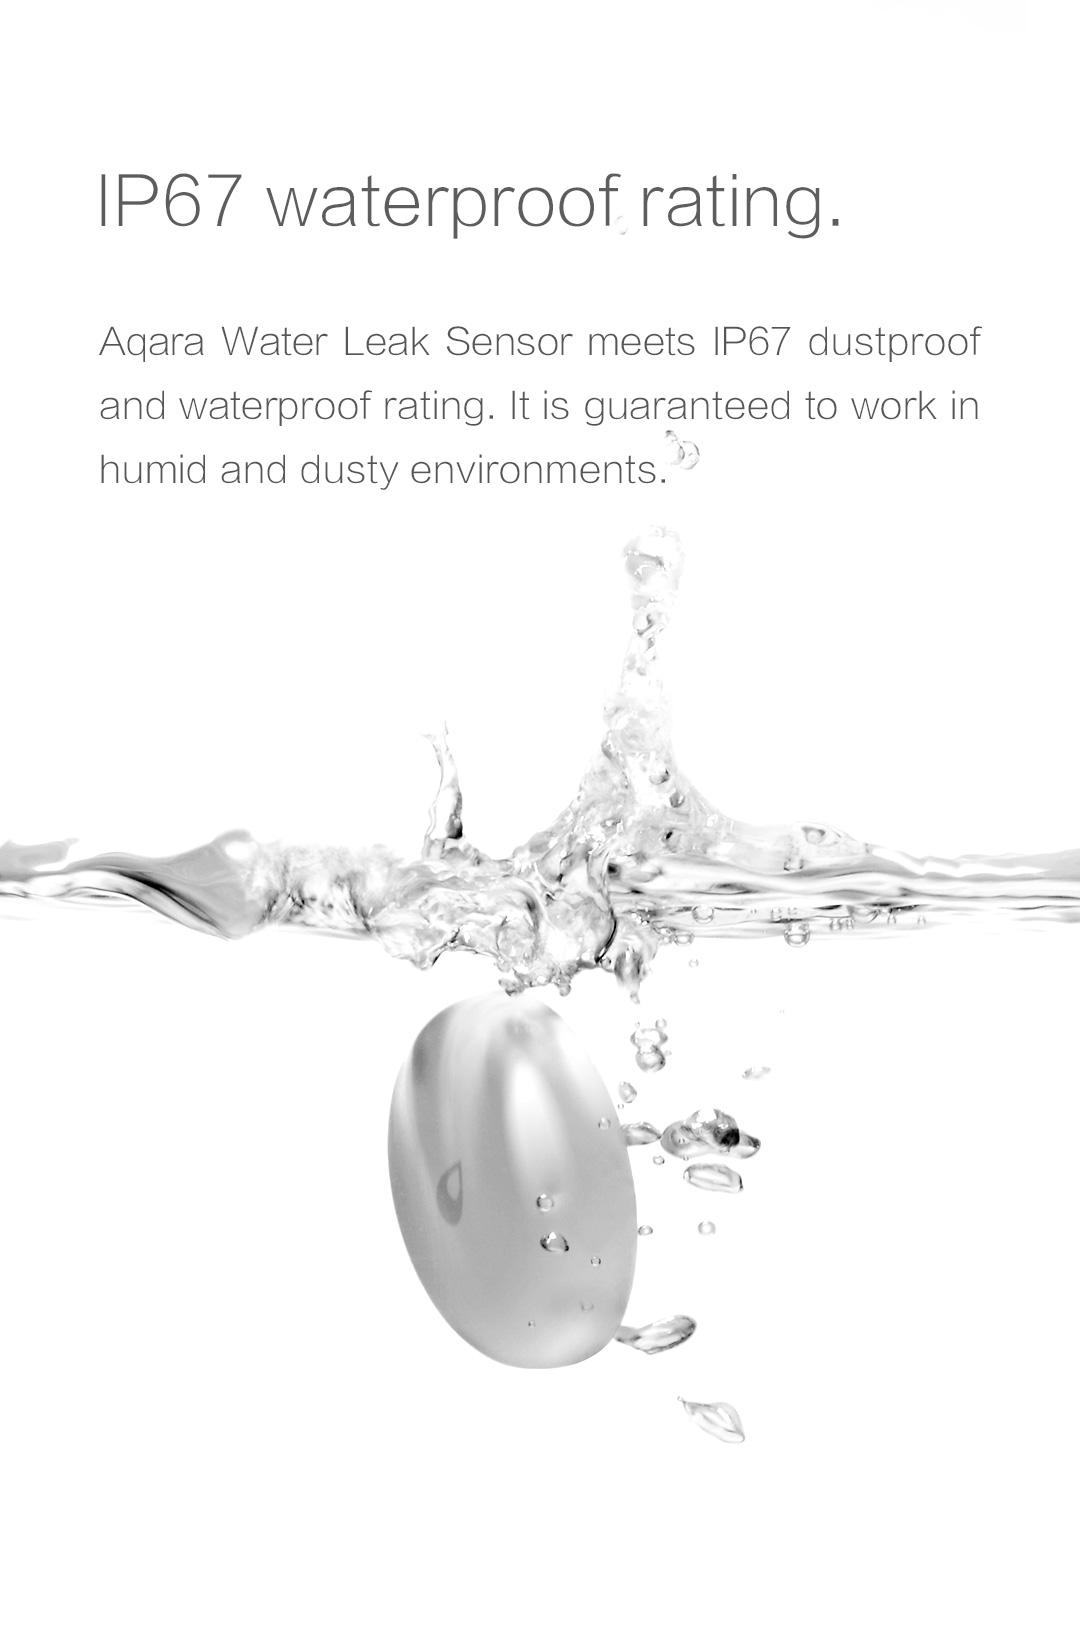 Our smart home water sensor meets IP67 dustproof and waterproof rating